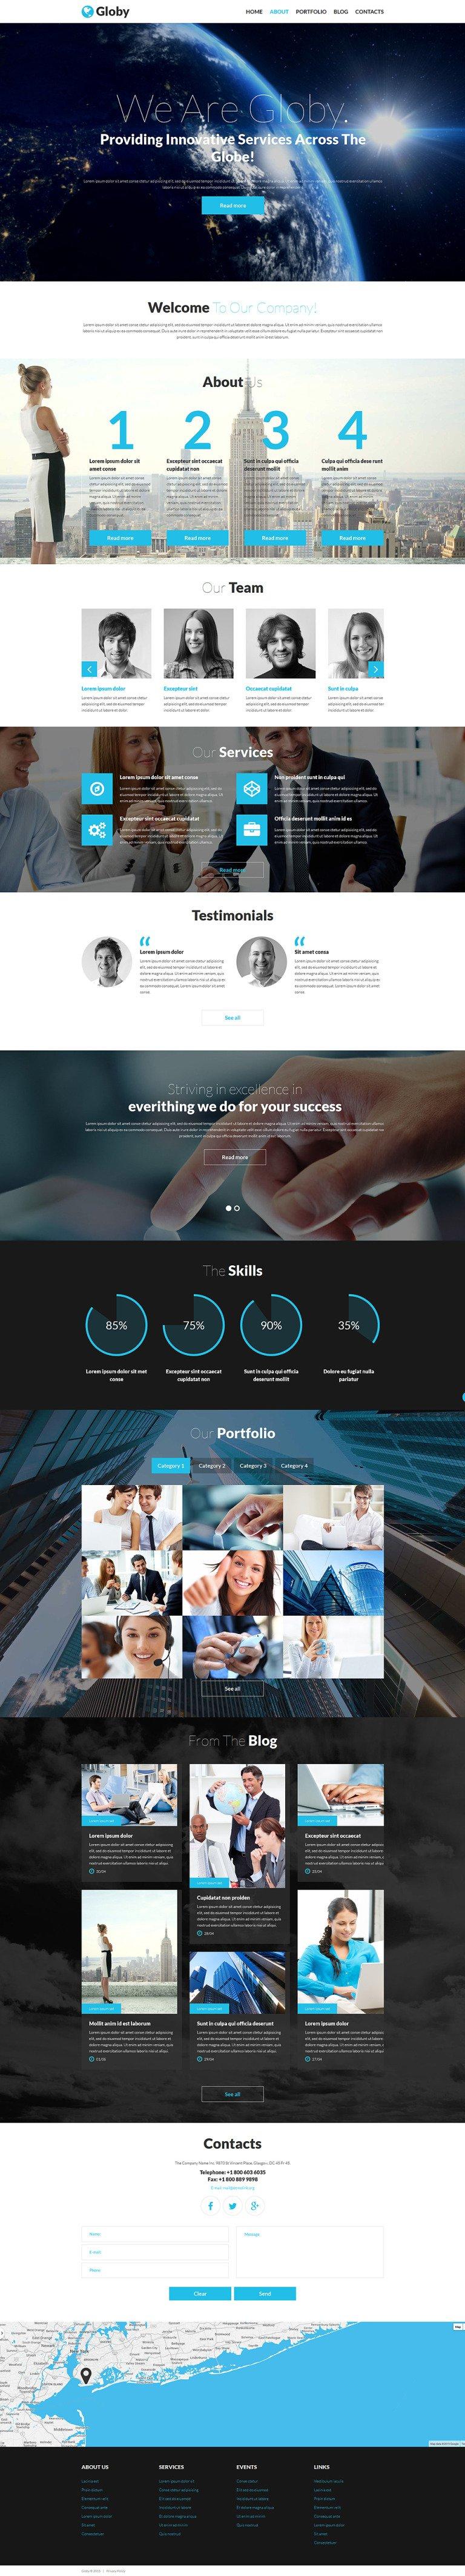 Your Business Joomla Template New Screenshots BIG